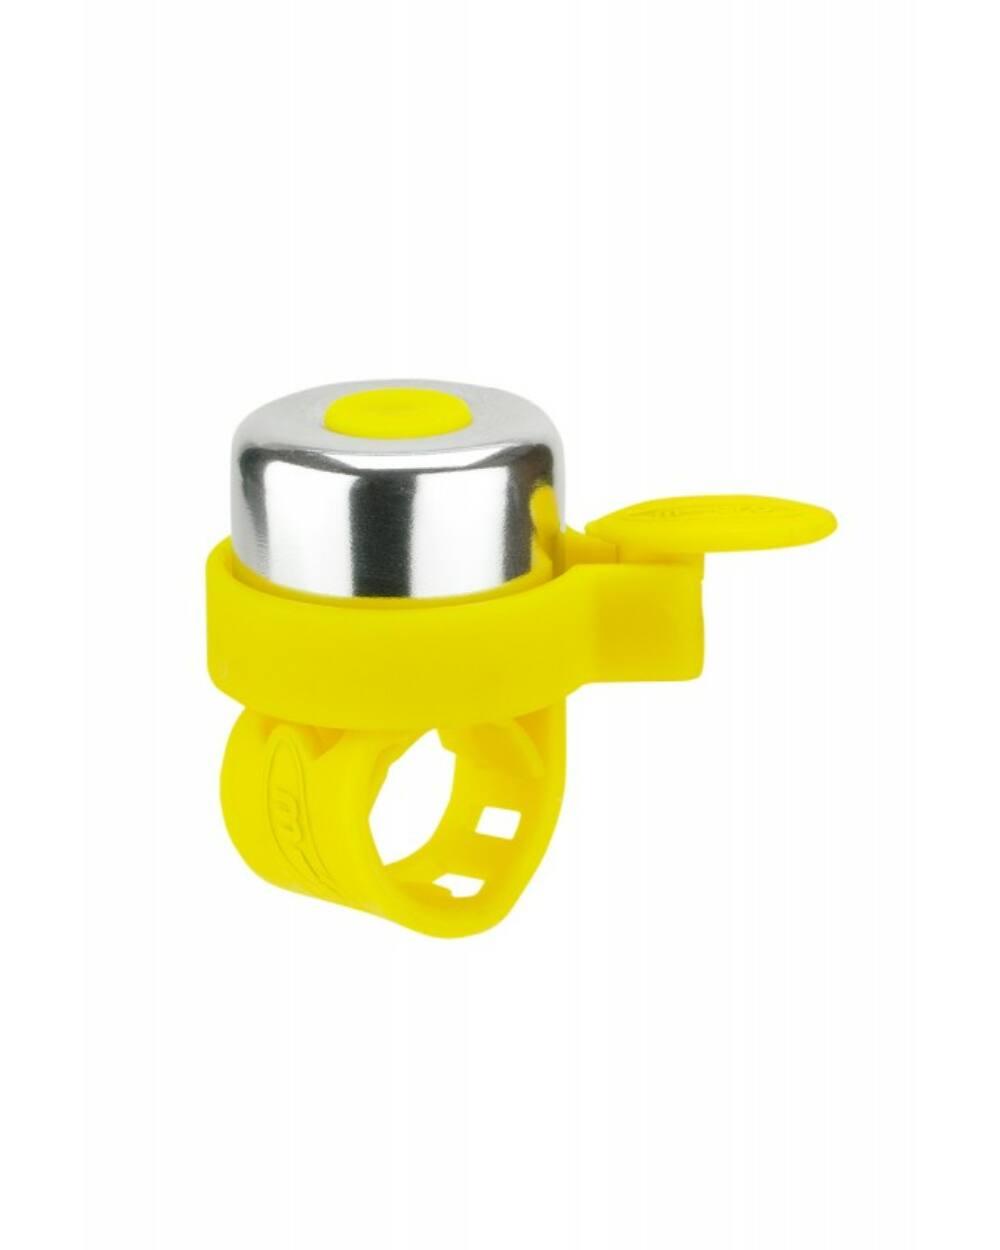 Micro roller csengő, neonsárga